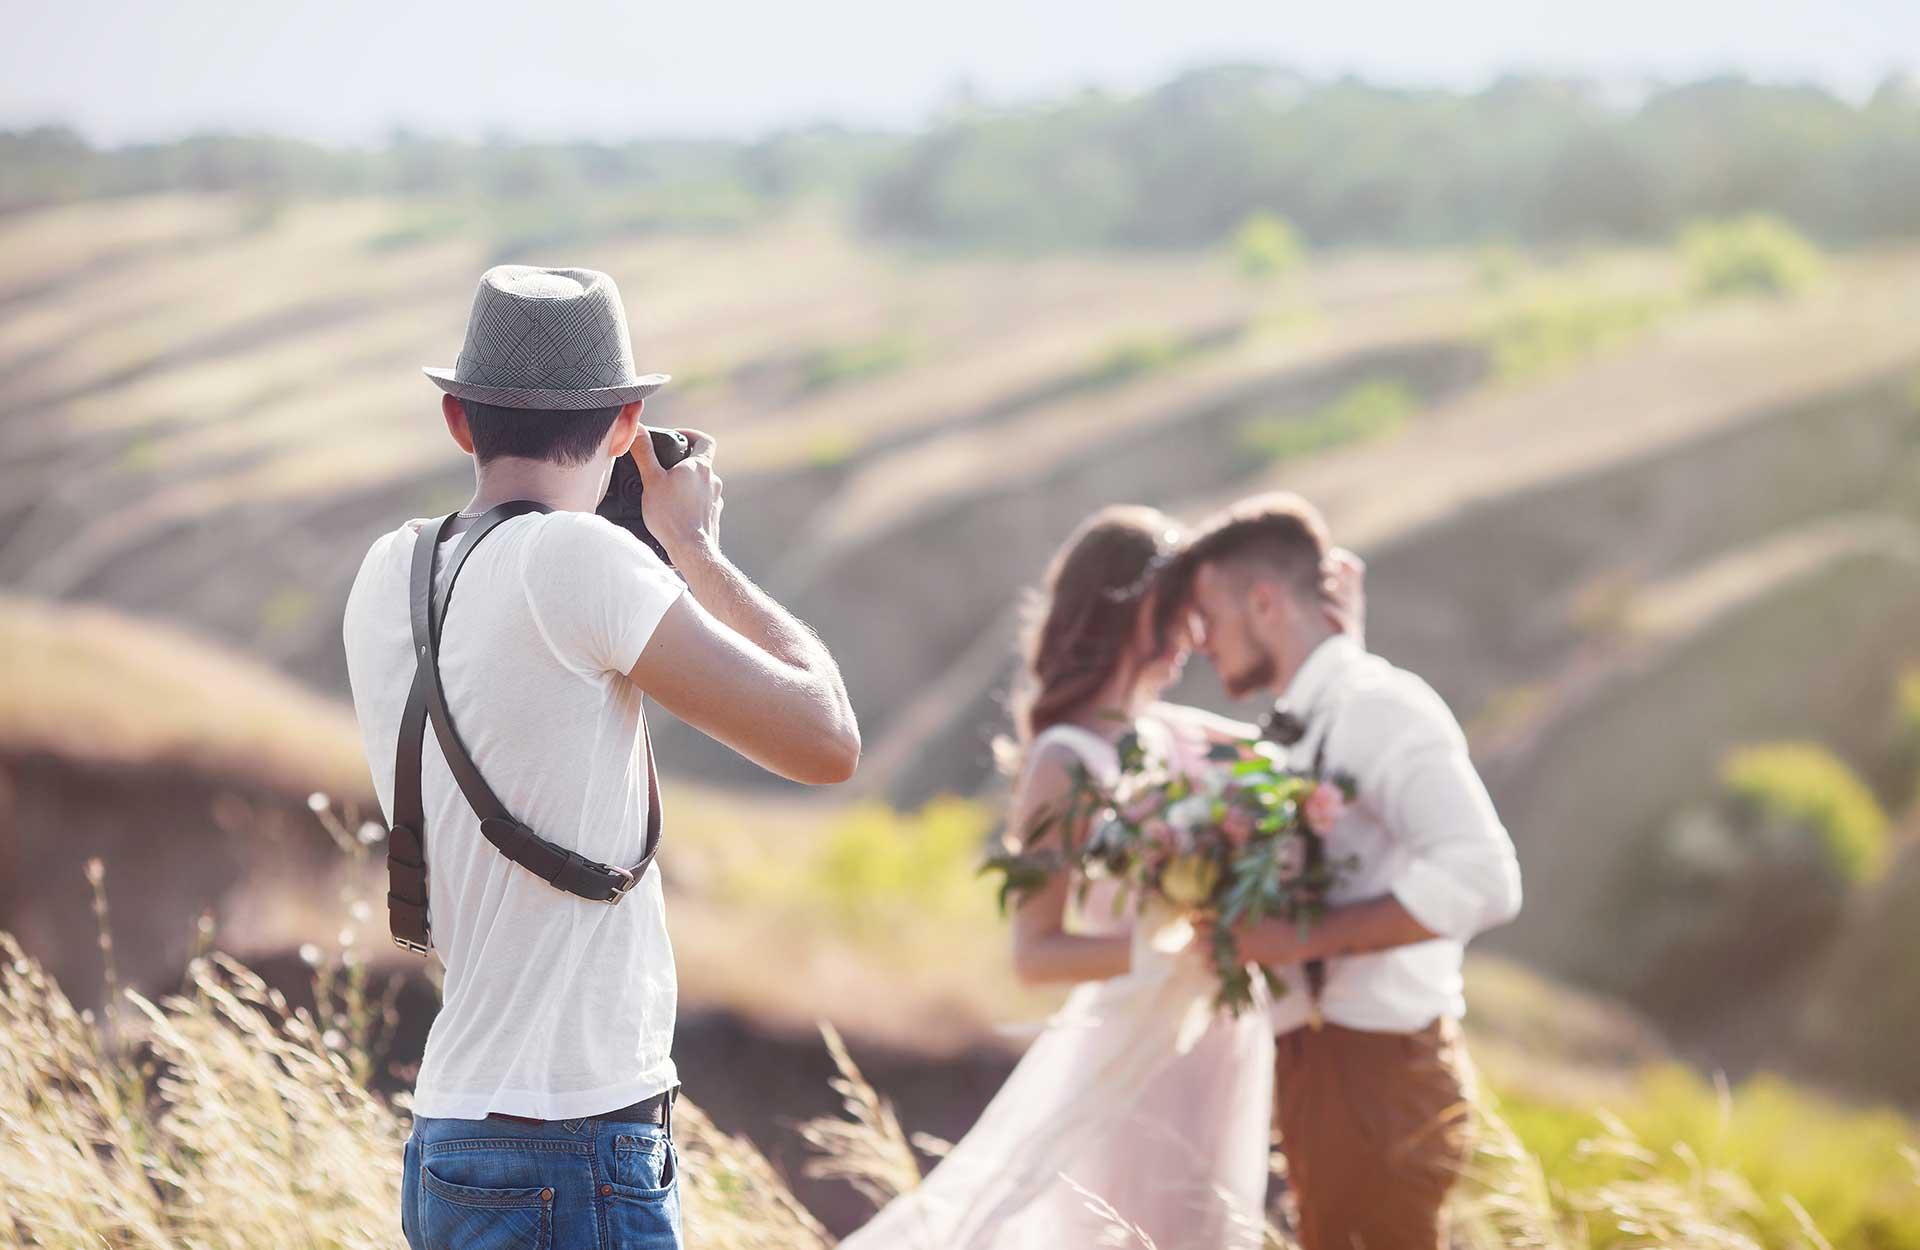 Portrætfotografering eller heldagsfotografering?